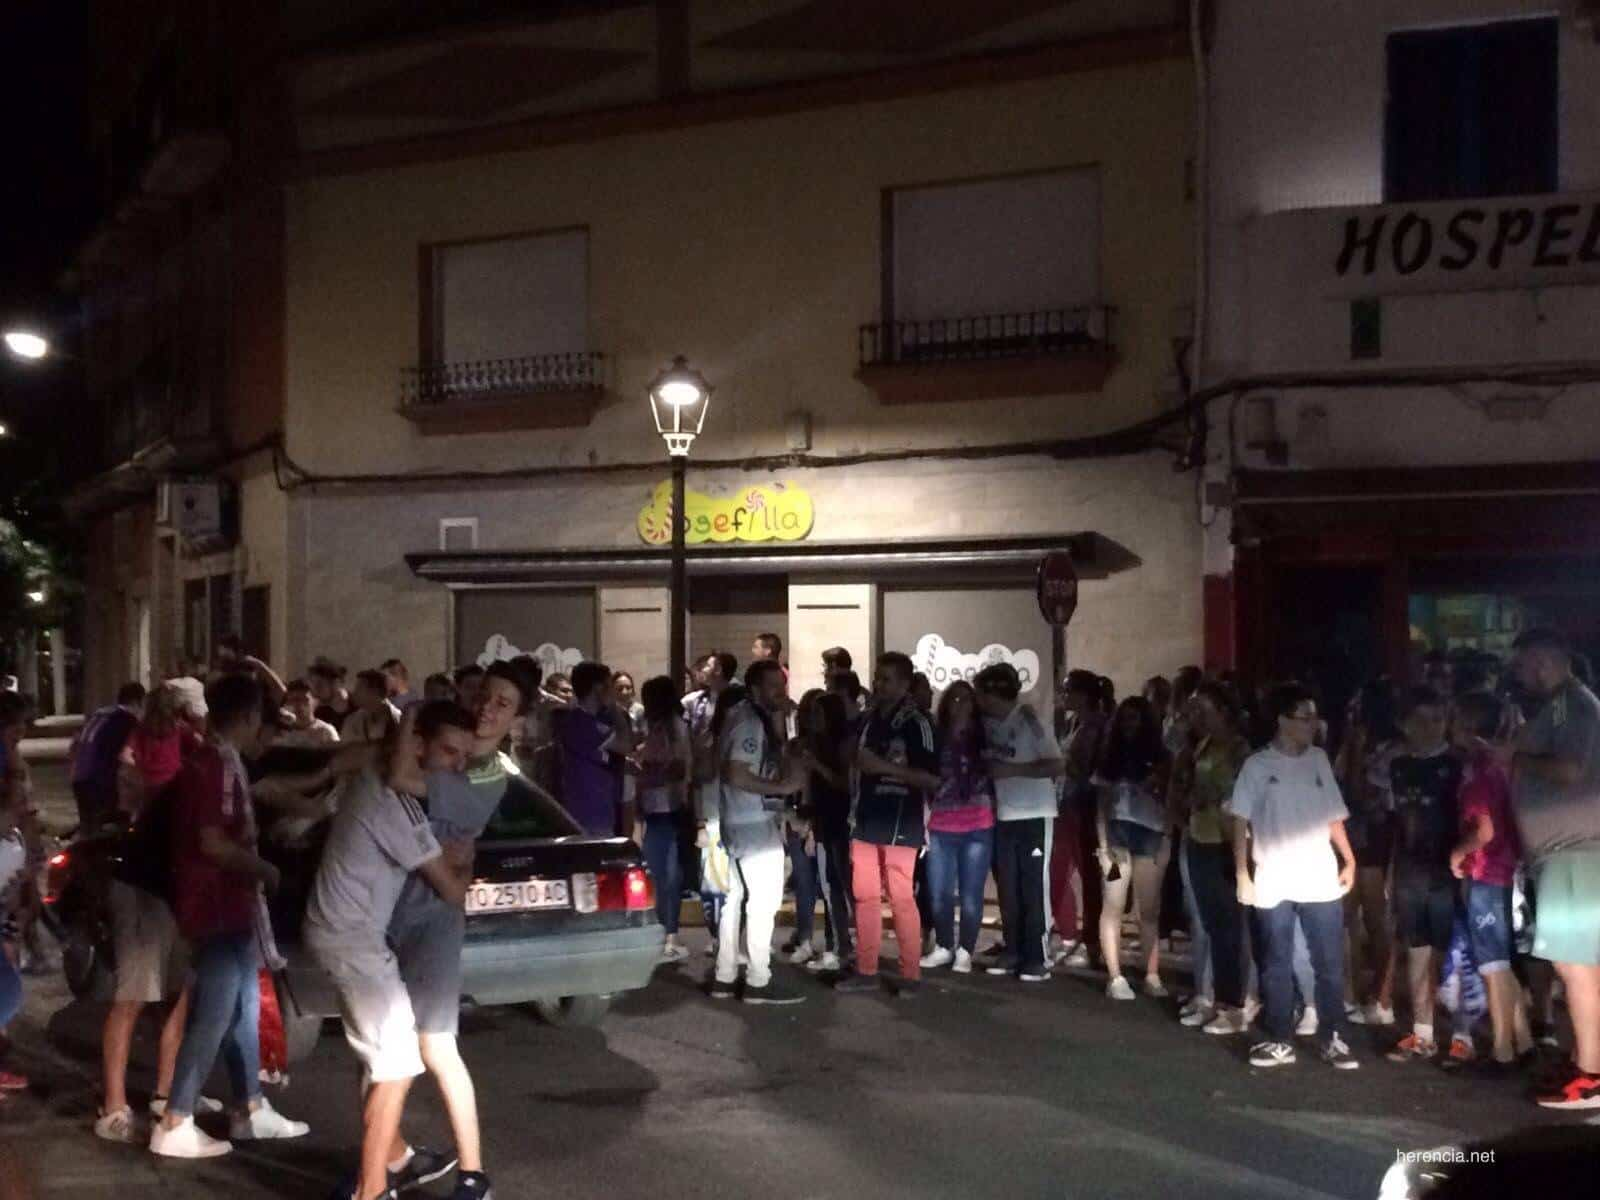 real madrid duodecima copa europa celebracion herencia 4 - Herencia celebra la Duodécima Copa de Europa que gana el Real Madrid